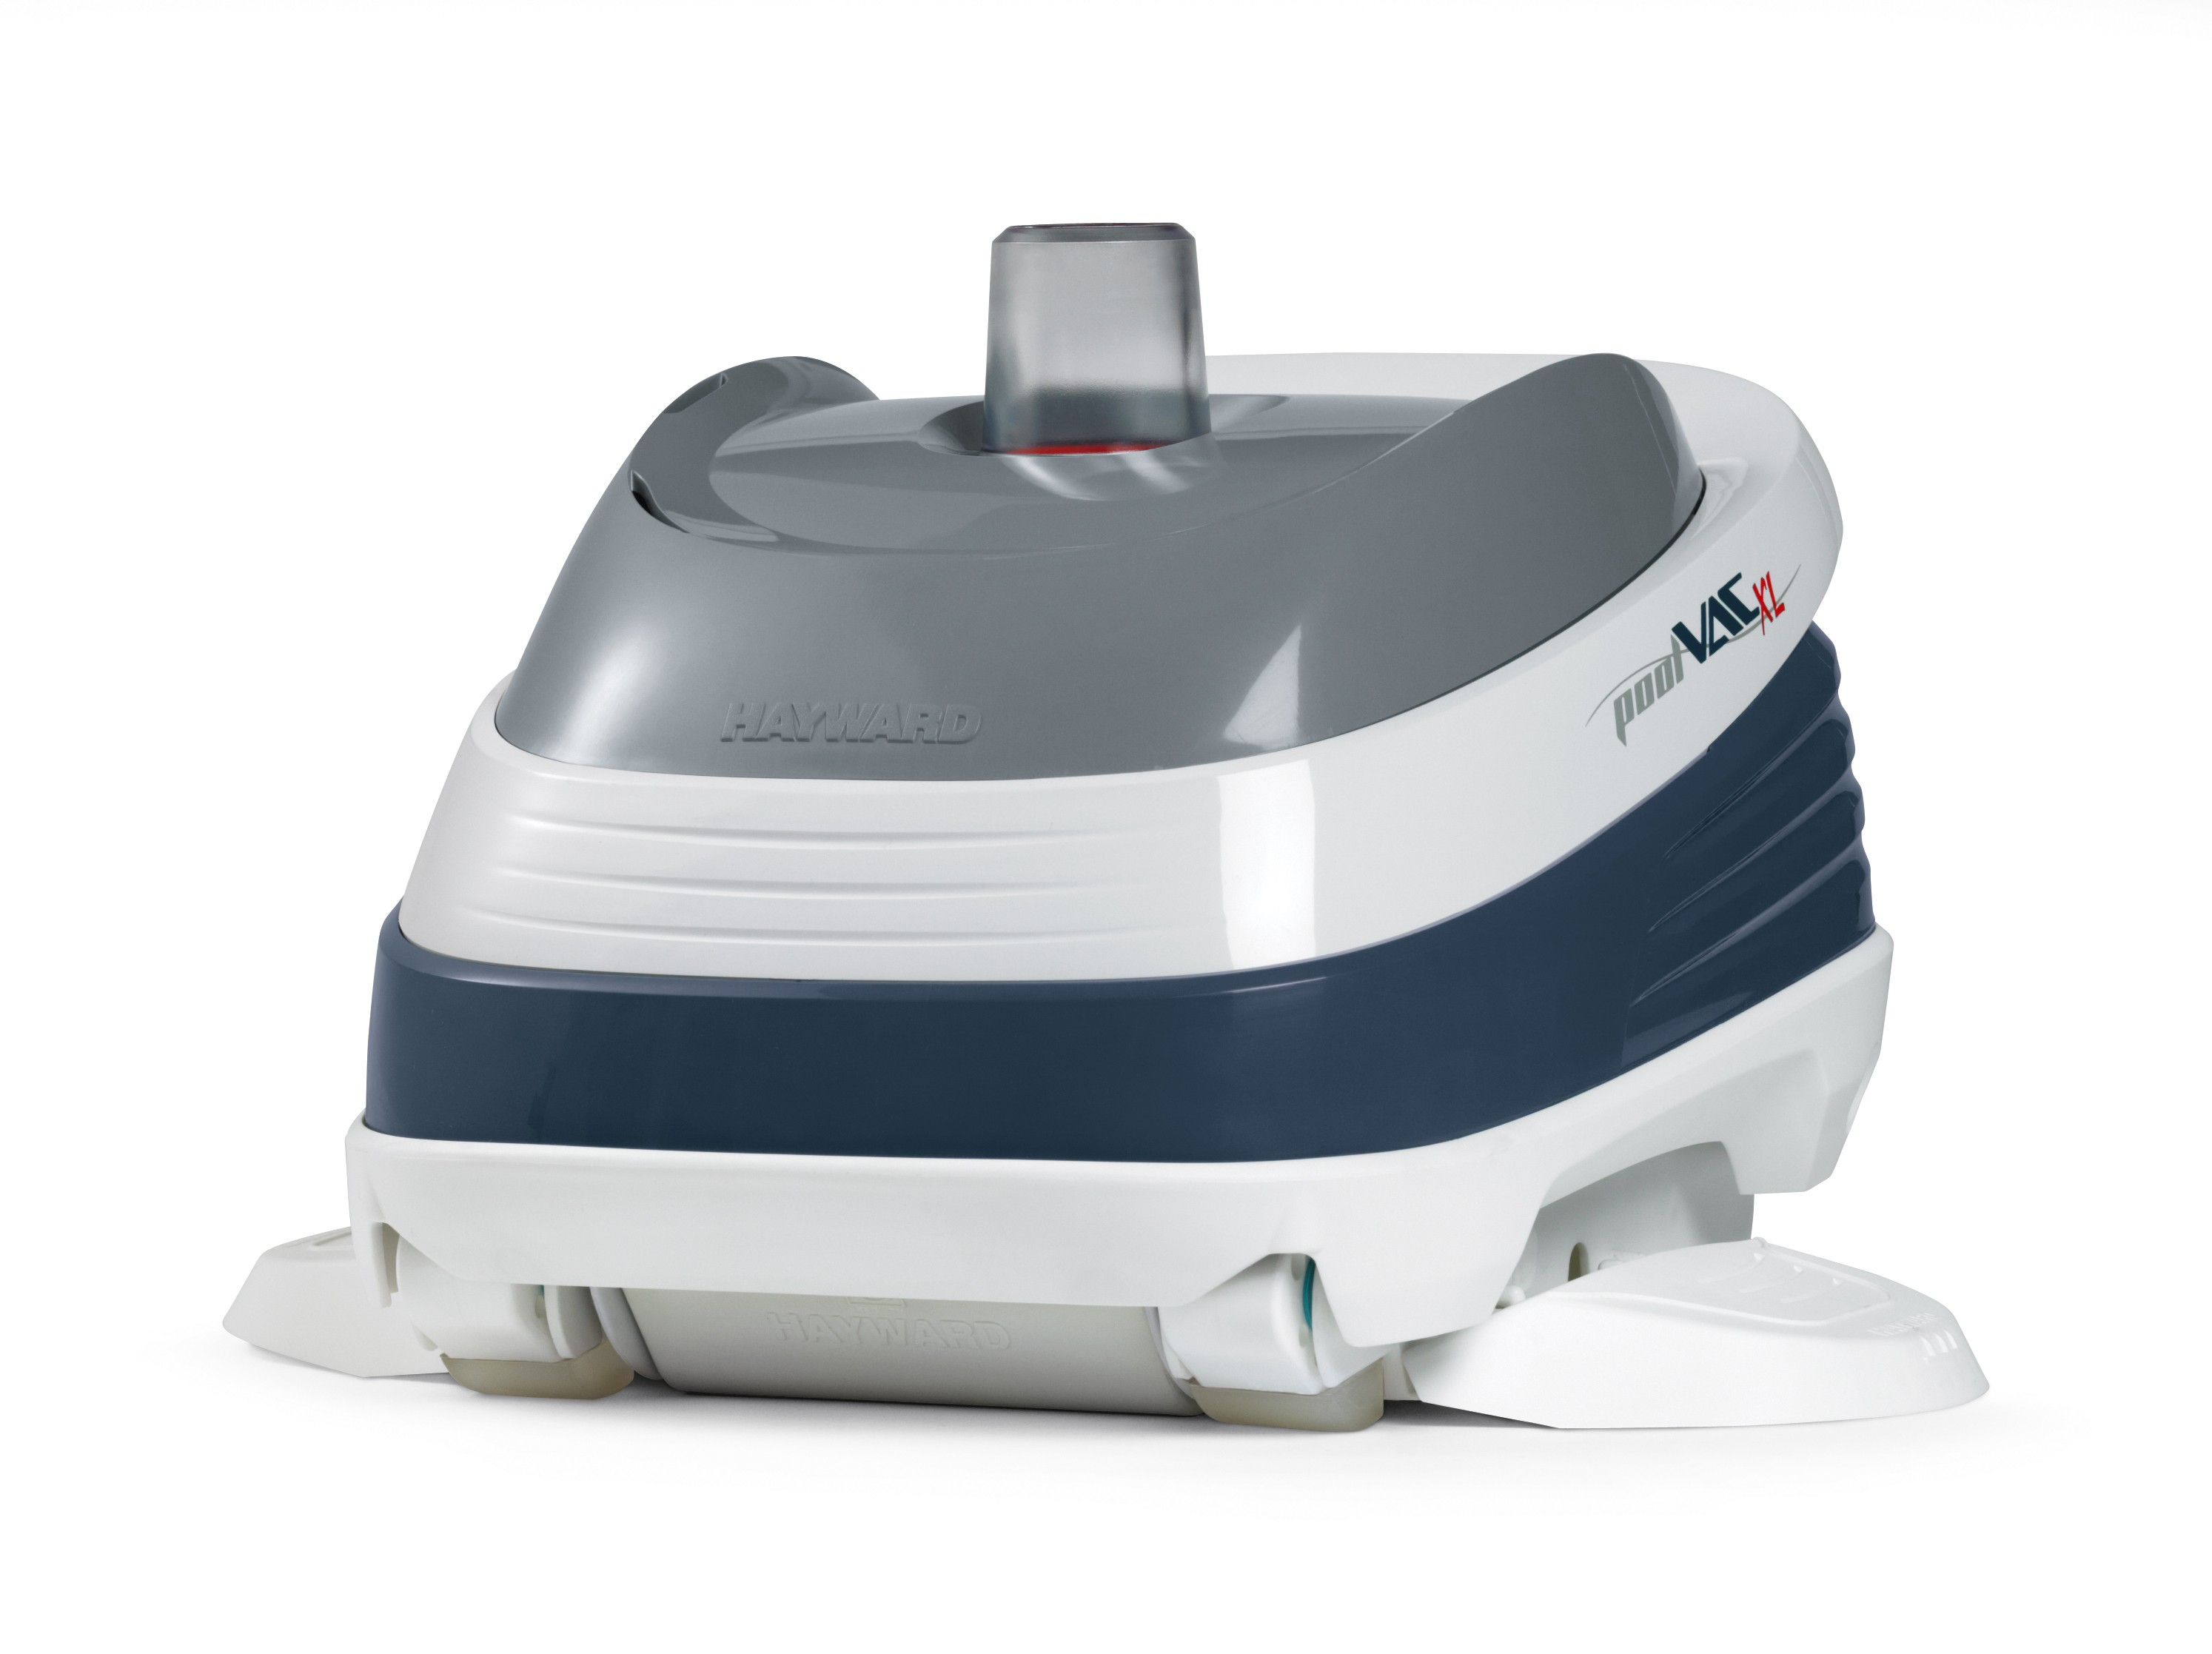 Hayward Pool Vac XL Pool Cleaner For Vinyl Pools (2025ADV)